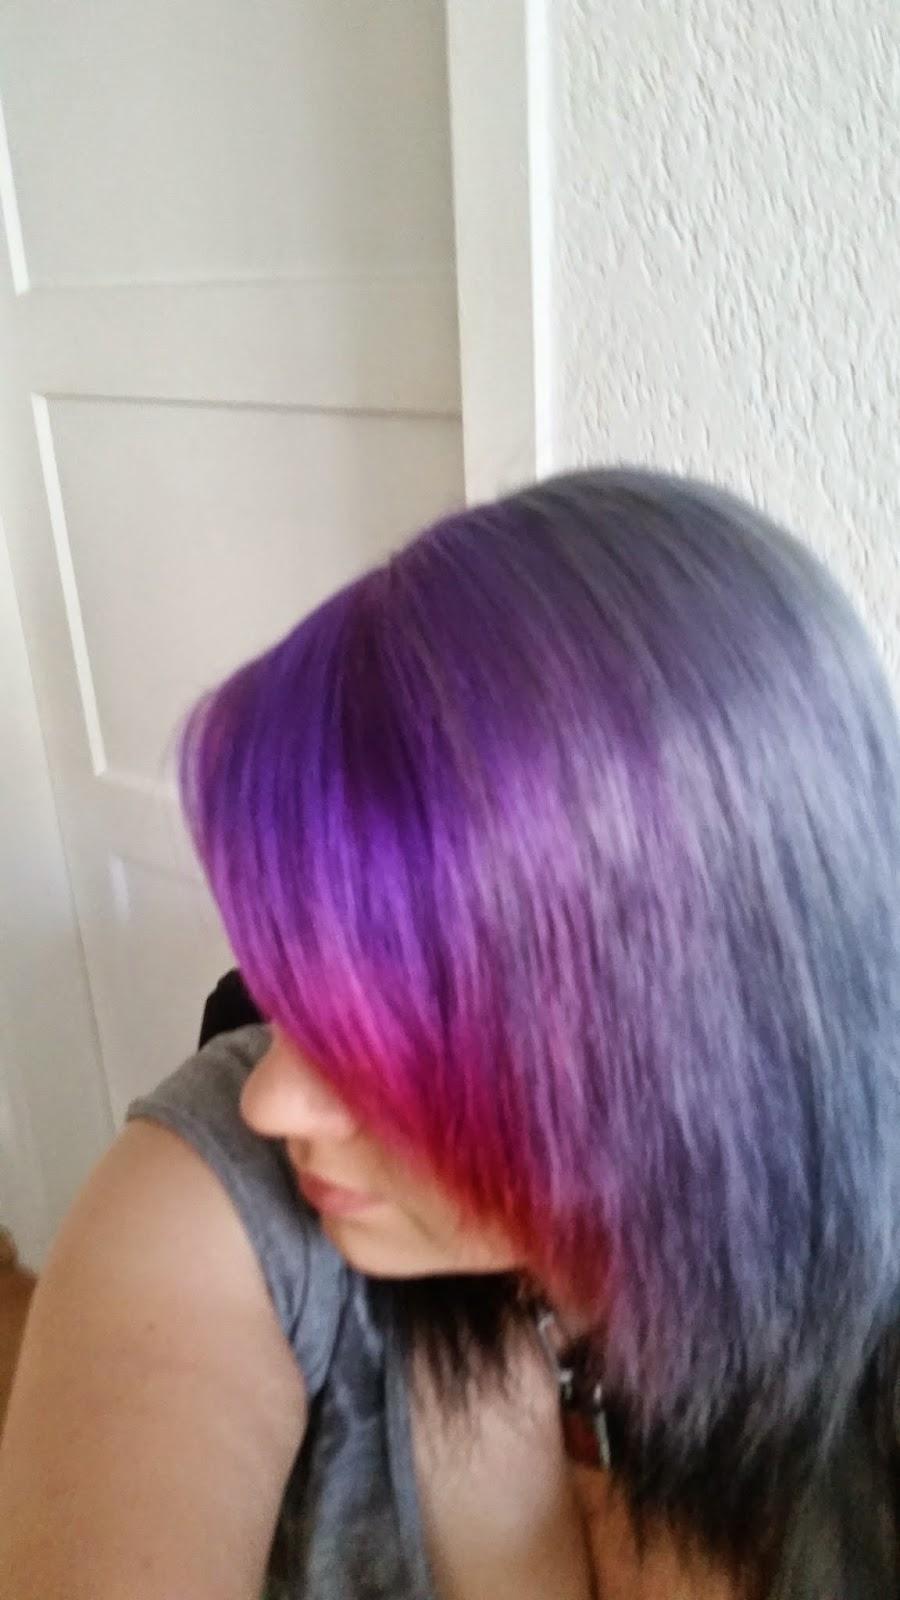 Pravana Vivid Hair Color Directions Hair Color 20162017